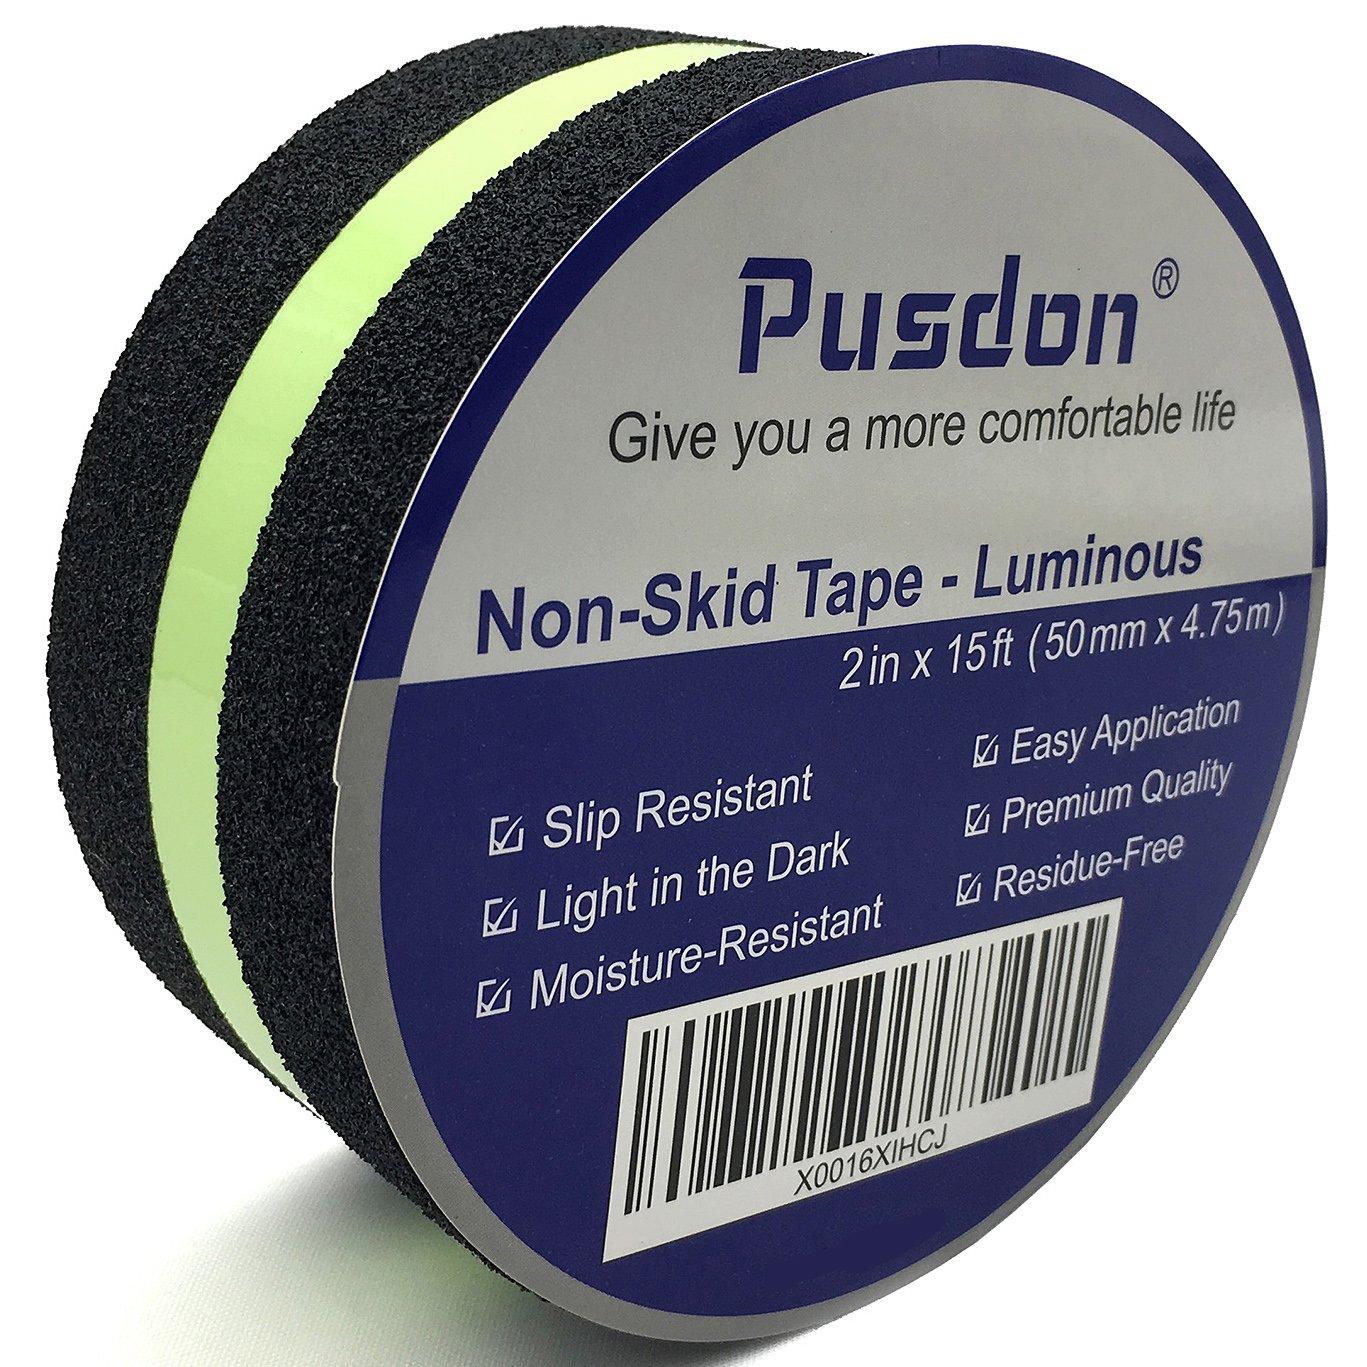 Pusdon Anti Slip Non Skid Safety Tape, Black, 3-Inch x 15Ft (76mm x 4.75m) PleasingCare